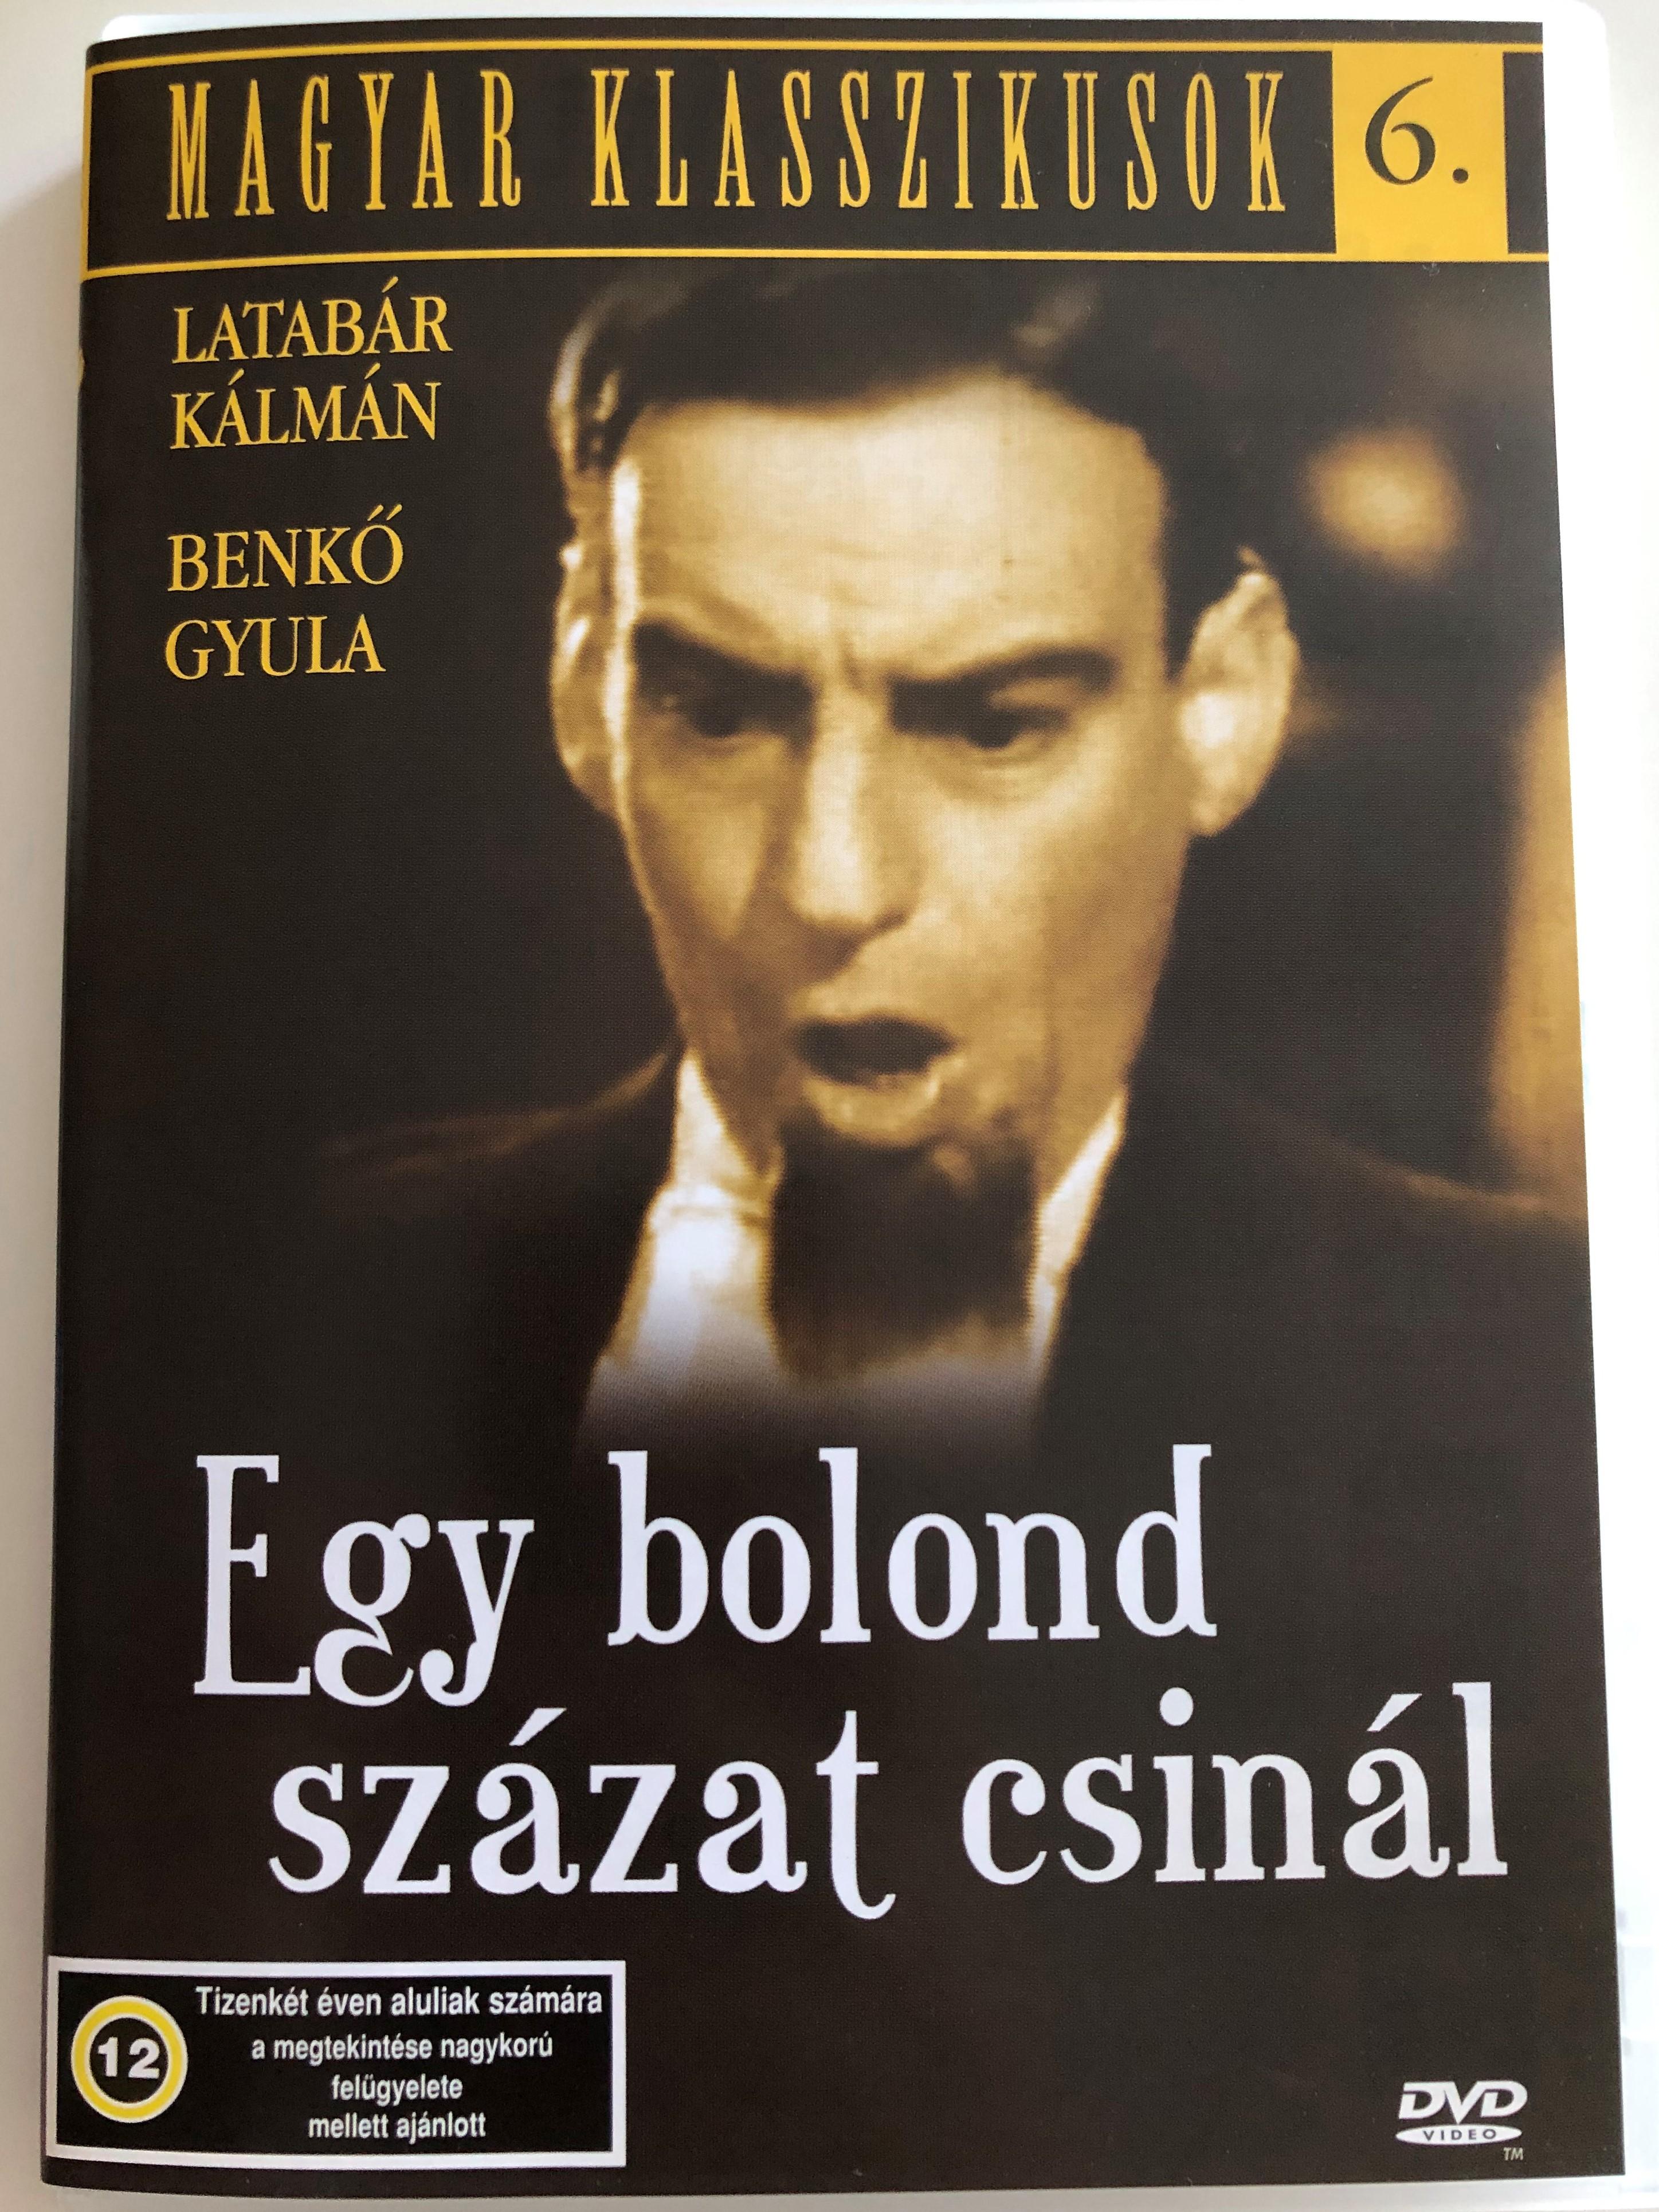 egy-bolond-sz-zat-csin-l-dvd-1942-directed-by-martonffy-emil-starring-latab-r-k-lm-n-benk-gyula-magyar-klasszikusok-6.-hungarian-classic-b-w-film-1-.jpg